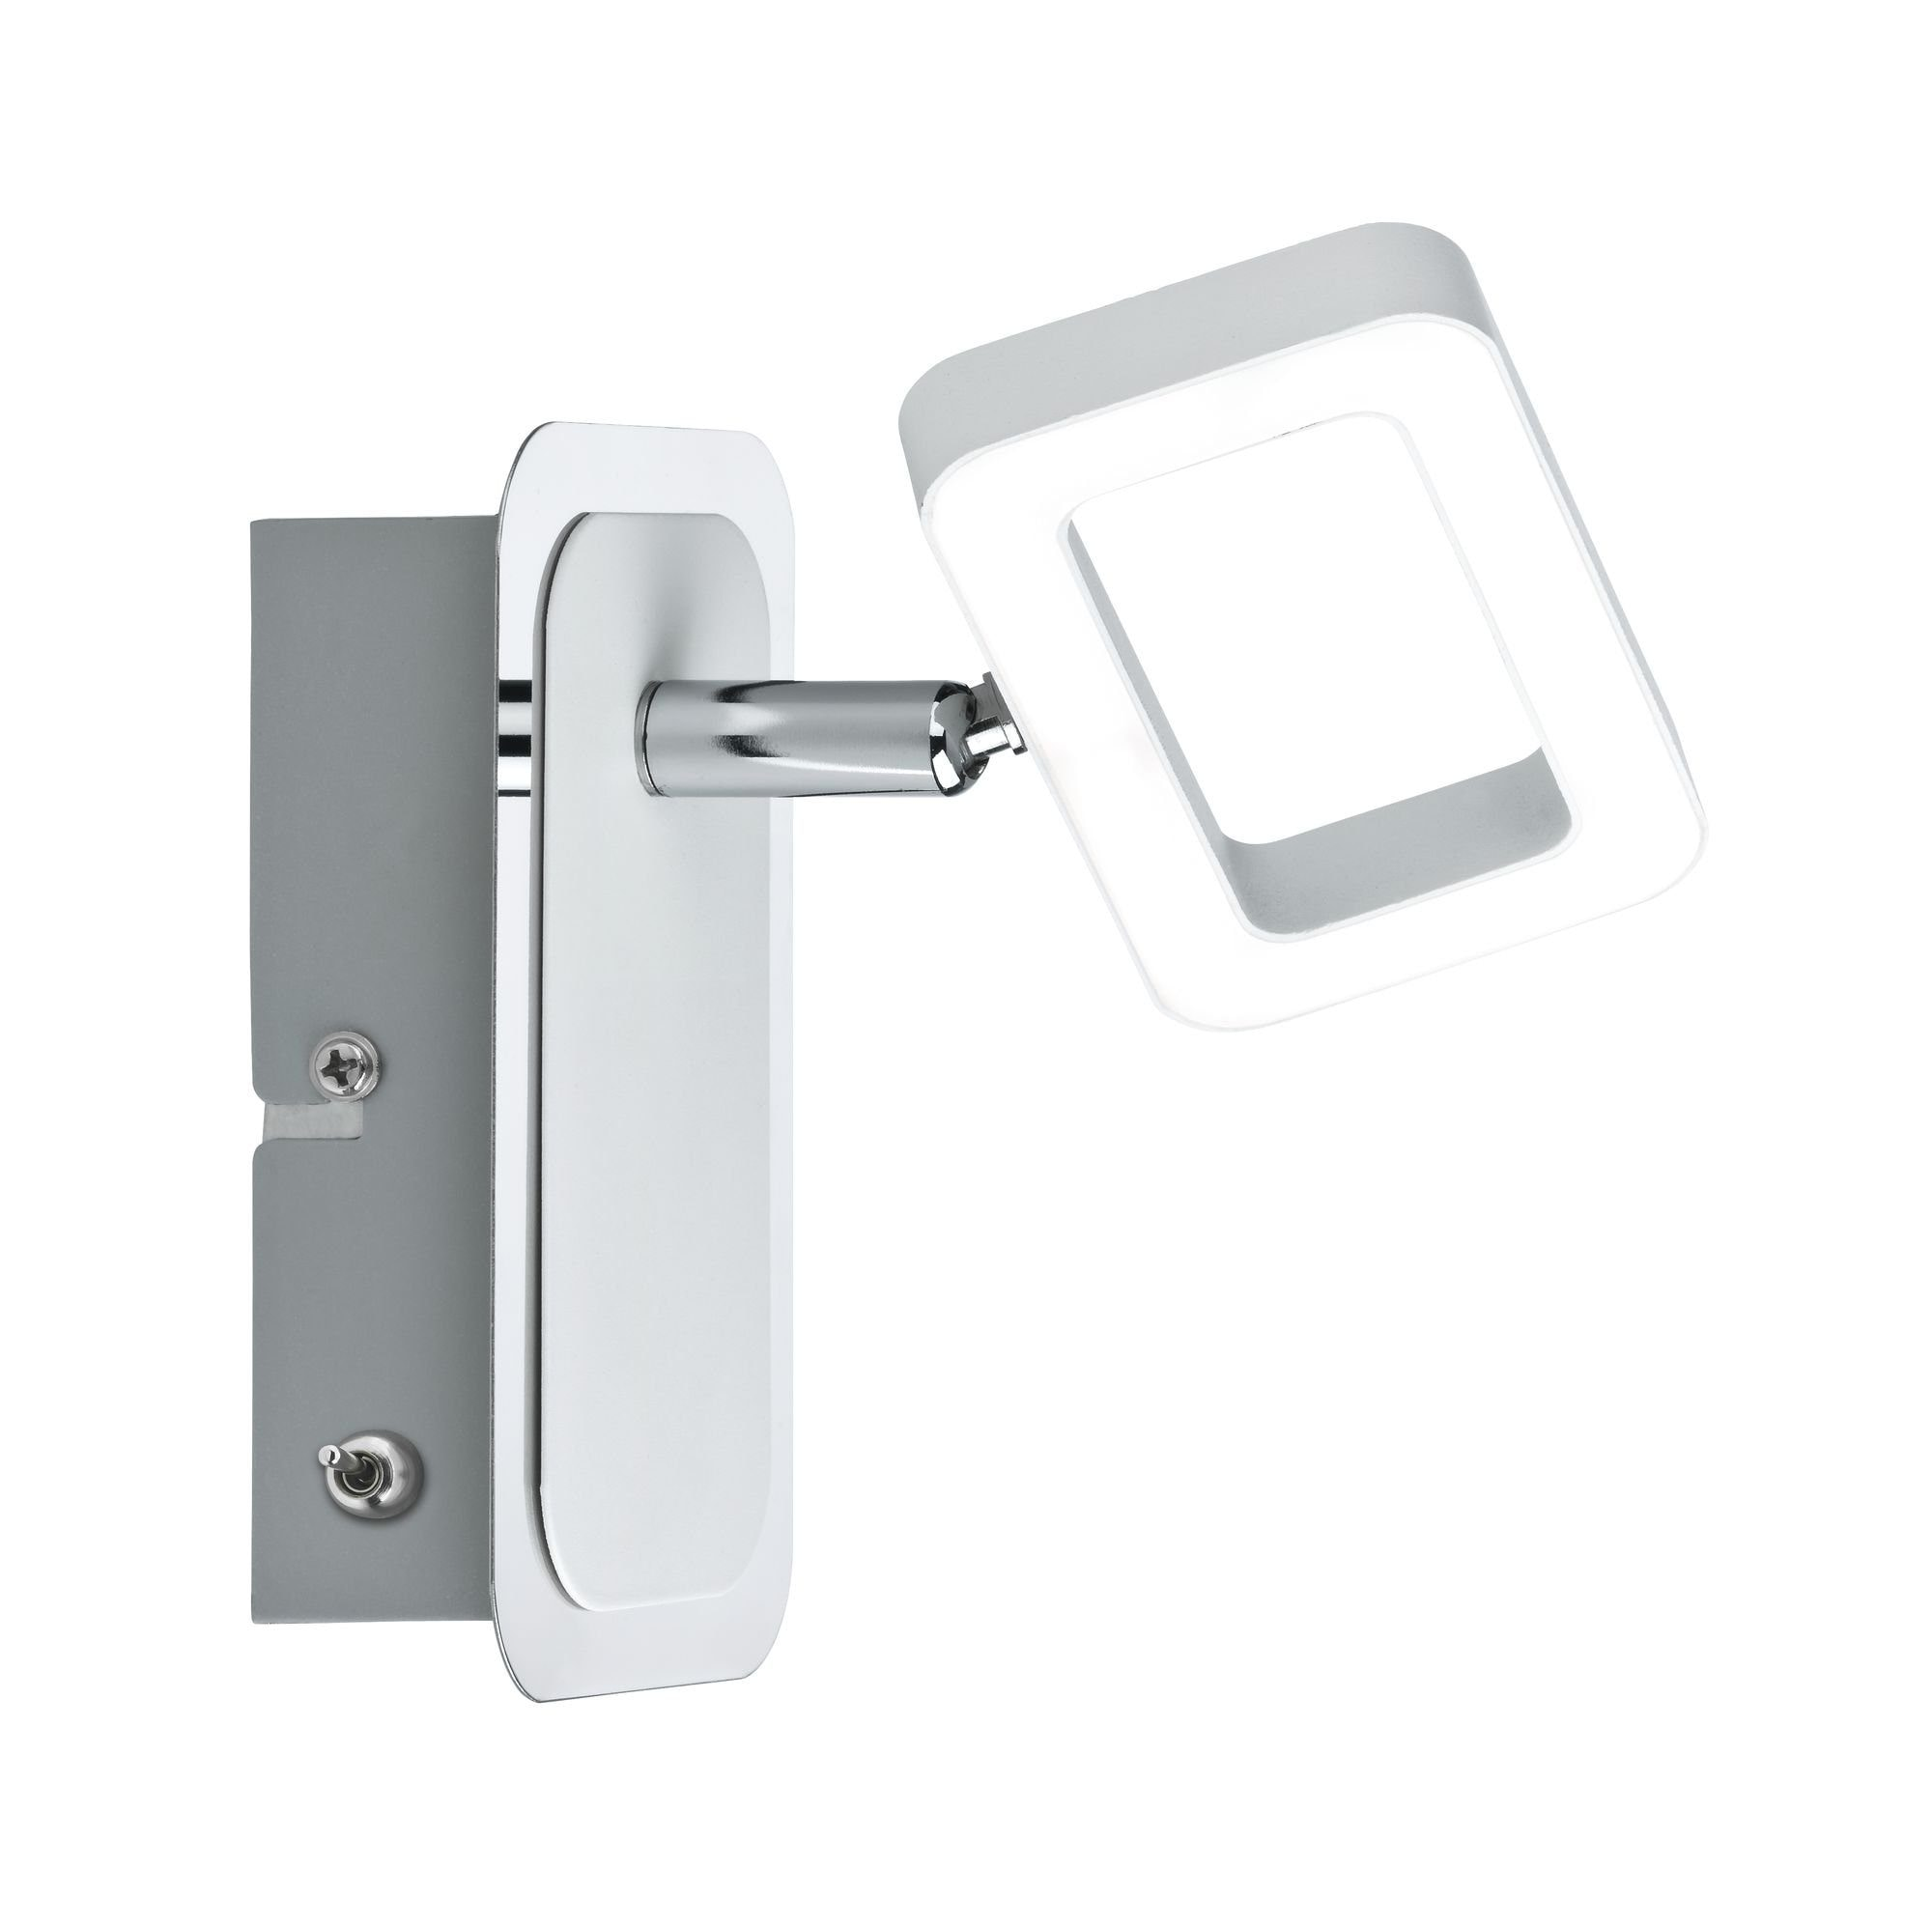 Paulmann LED Wandstrahler Frame Weiß/Chrom 1-flammig inkl. Leuchtmittel 1x4,5W, 1 St., Warmweiß